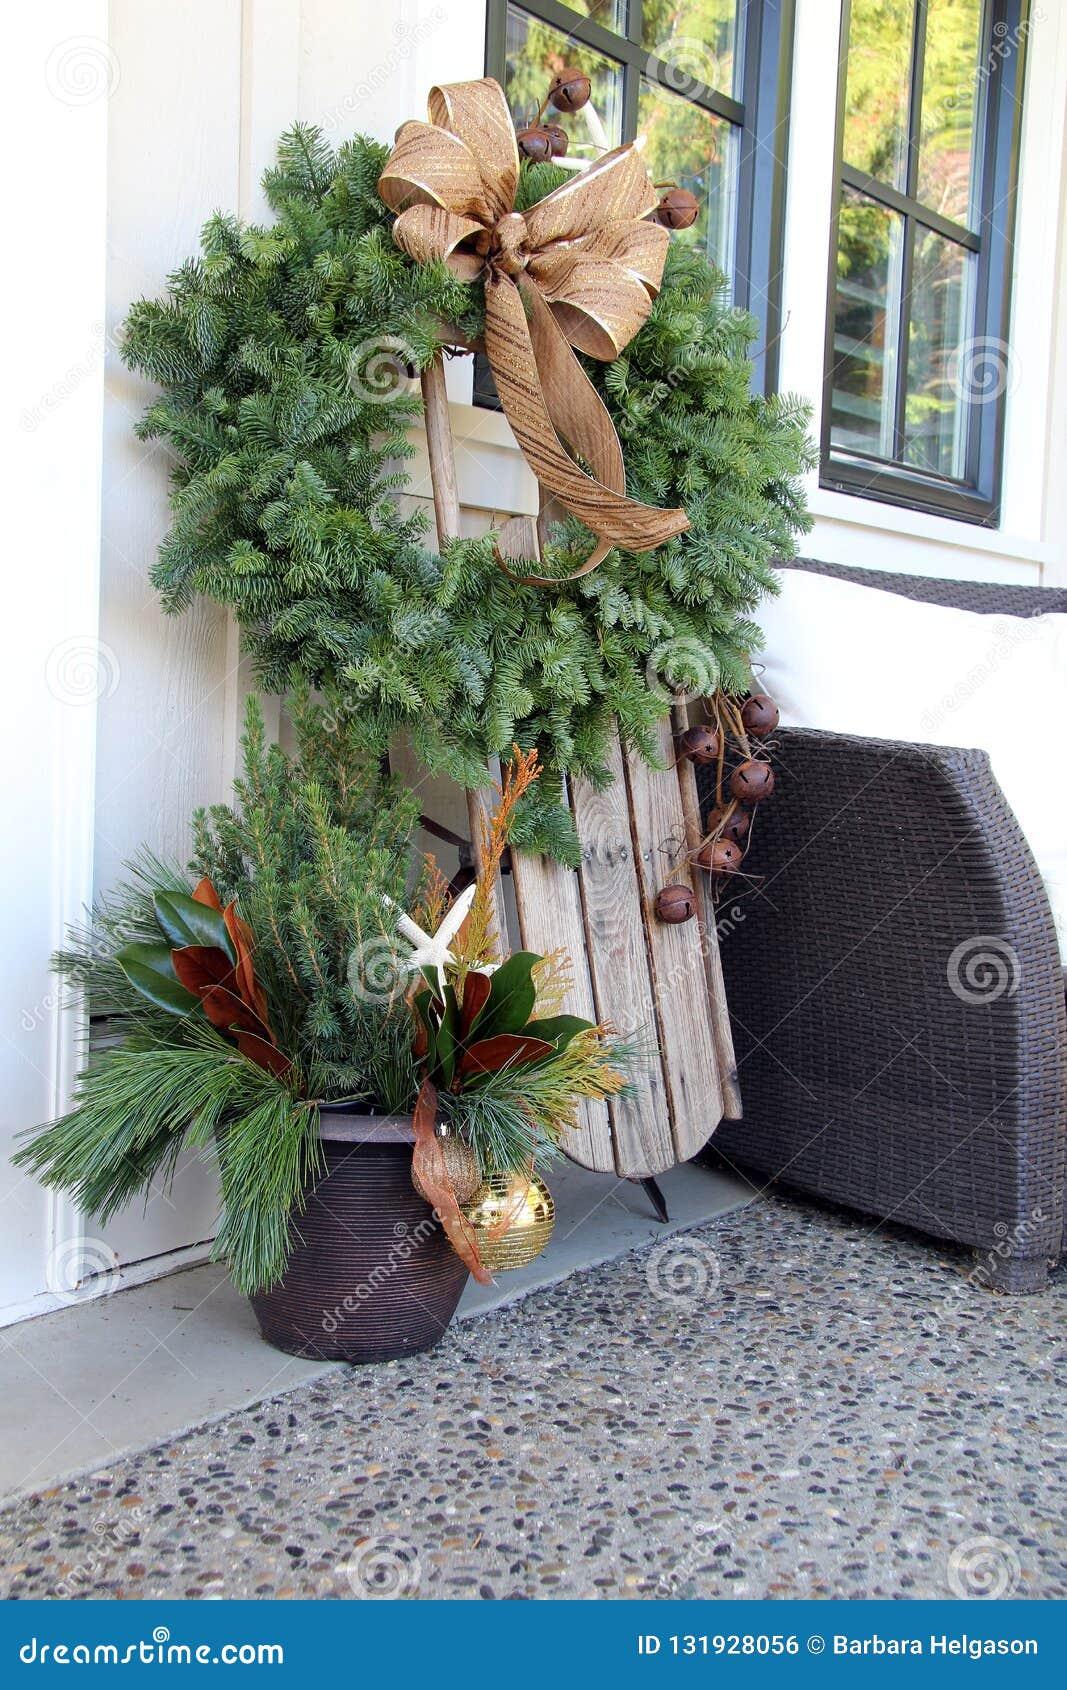 Christmas wreath and sled